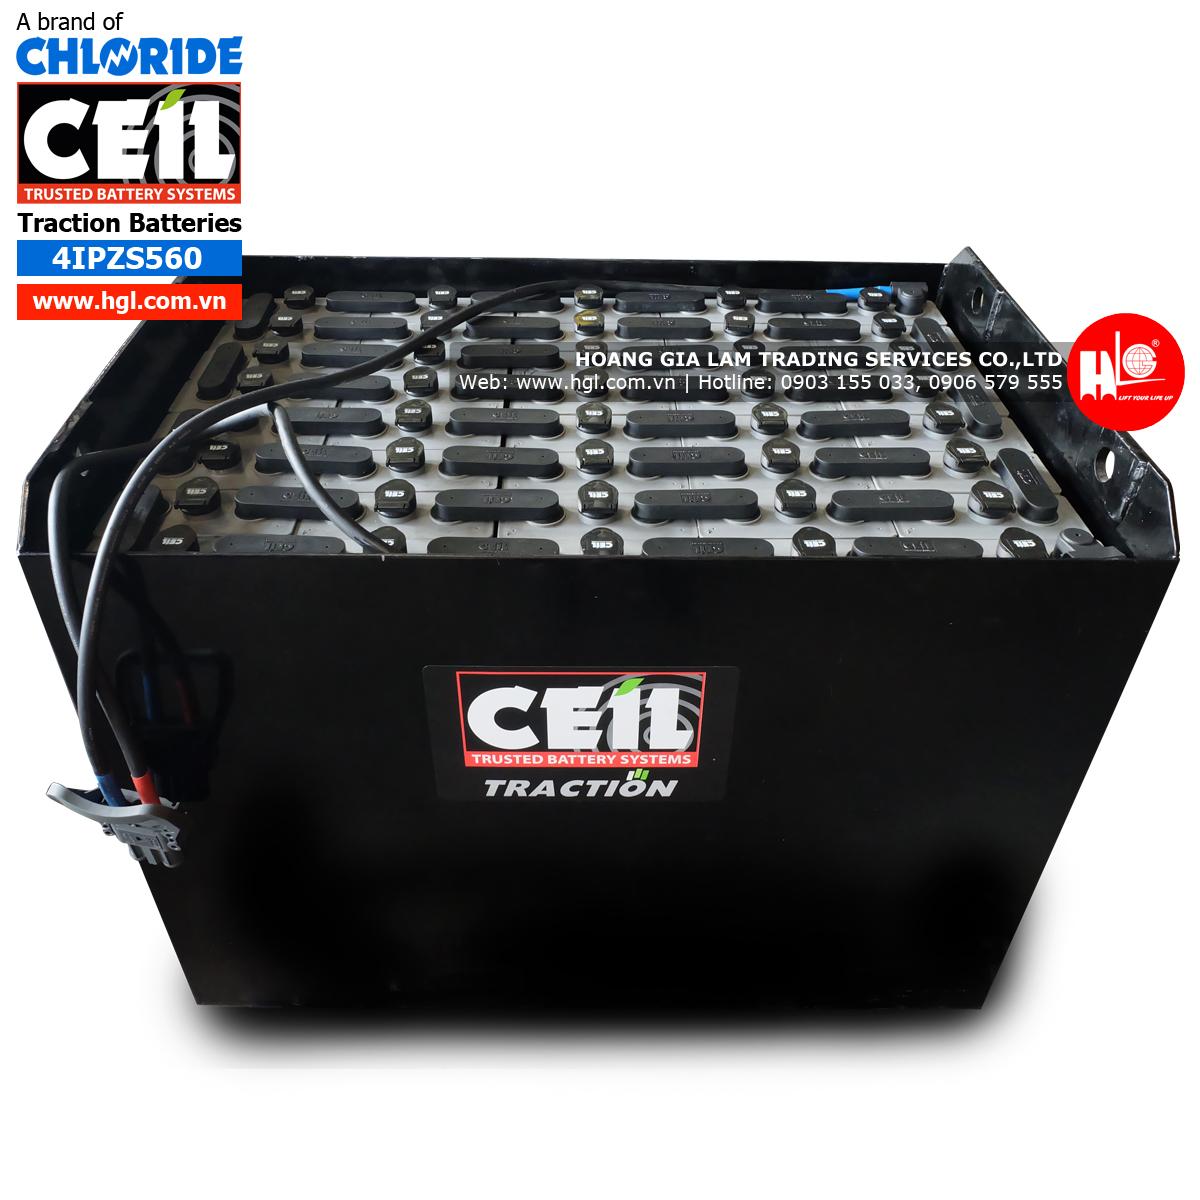 binh-dien-xe-nang-chloride-ceil-560ah-48v-4IPZS560-1